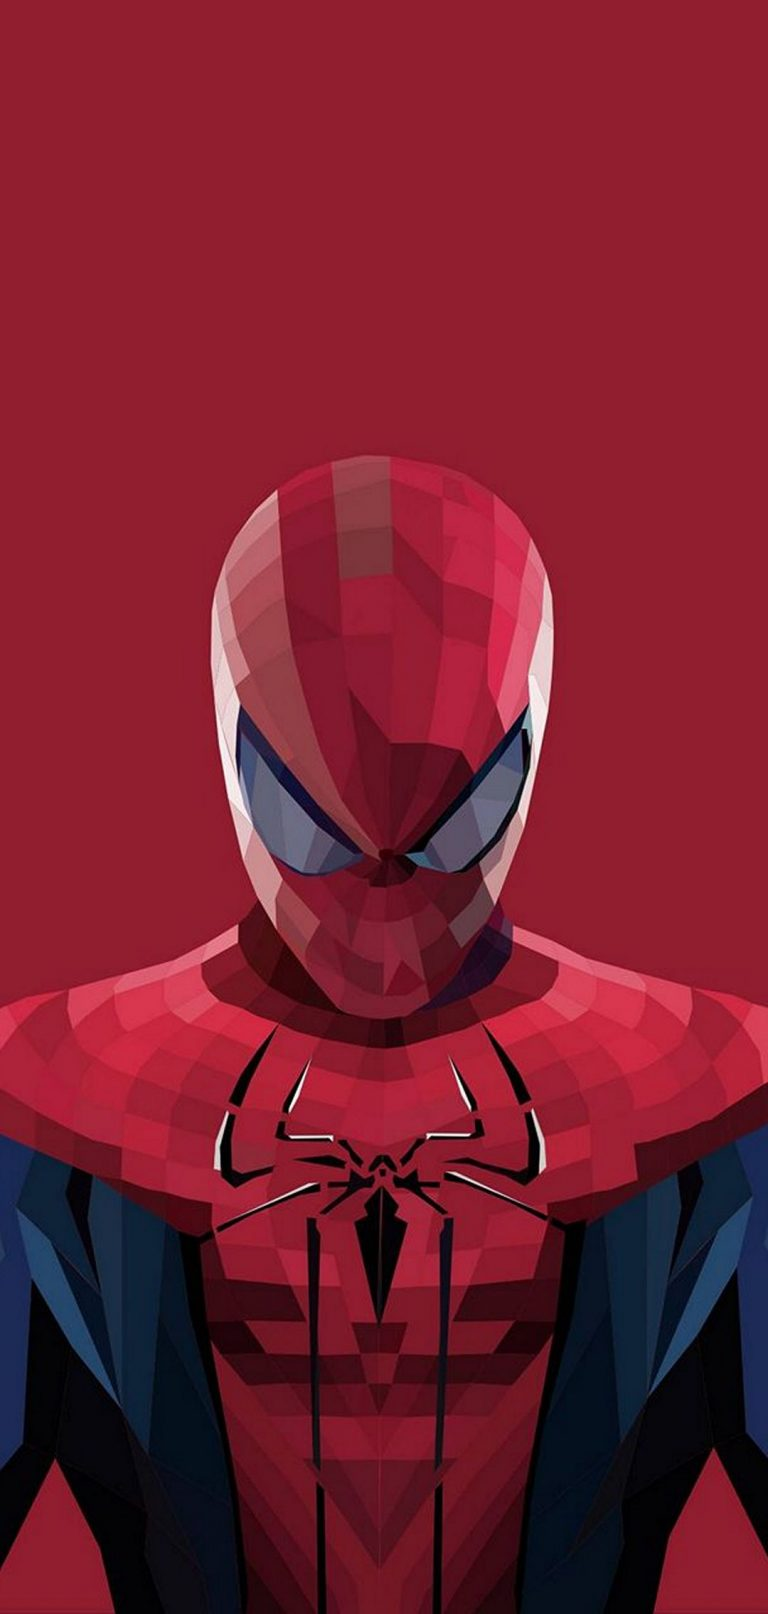 Superhero Spiderman Cartoon